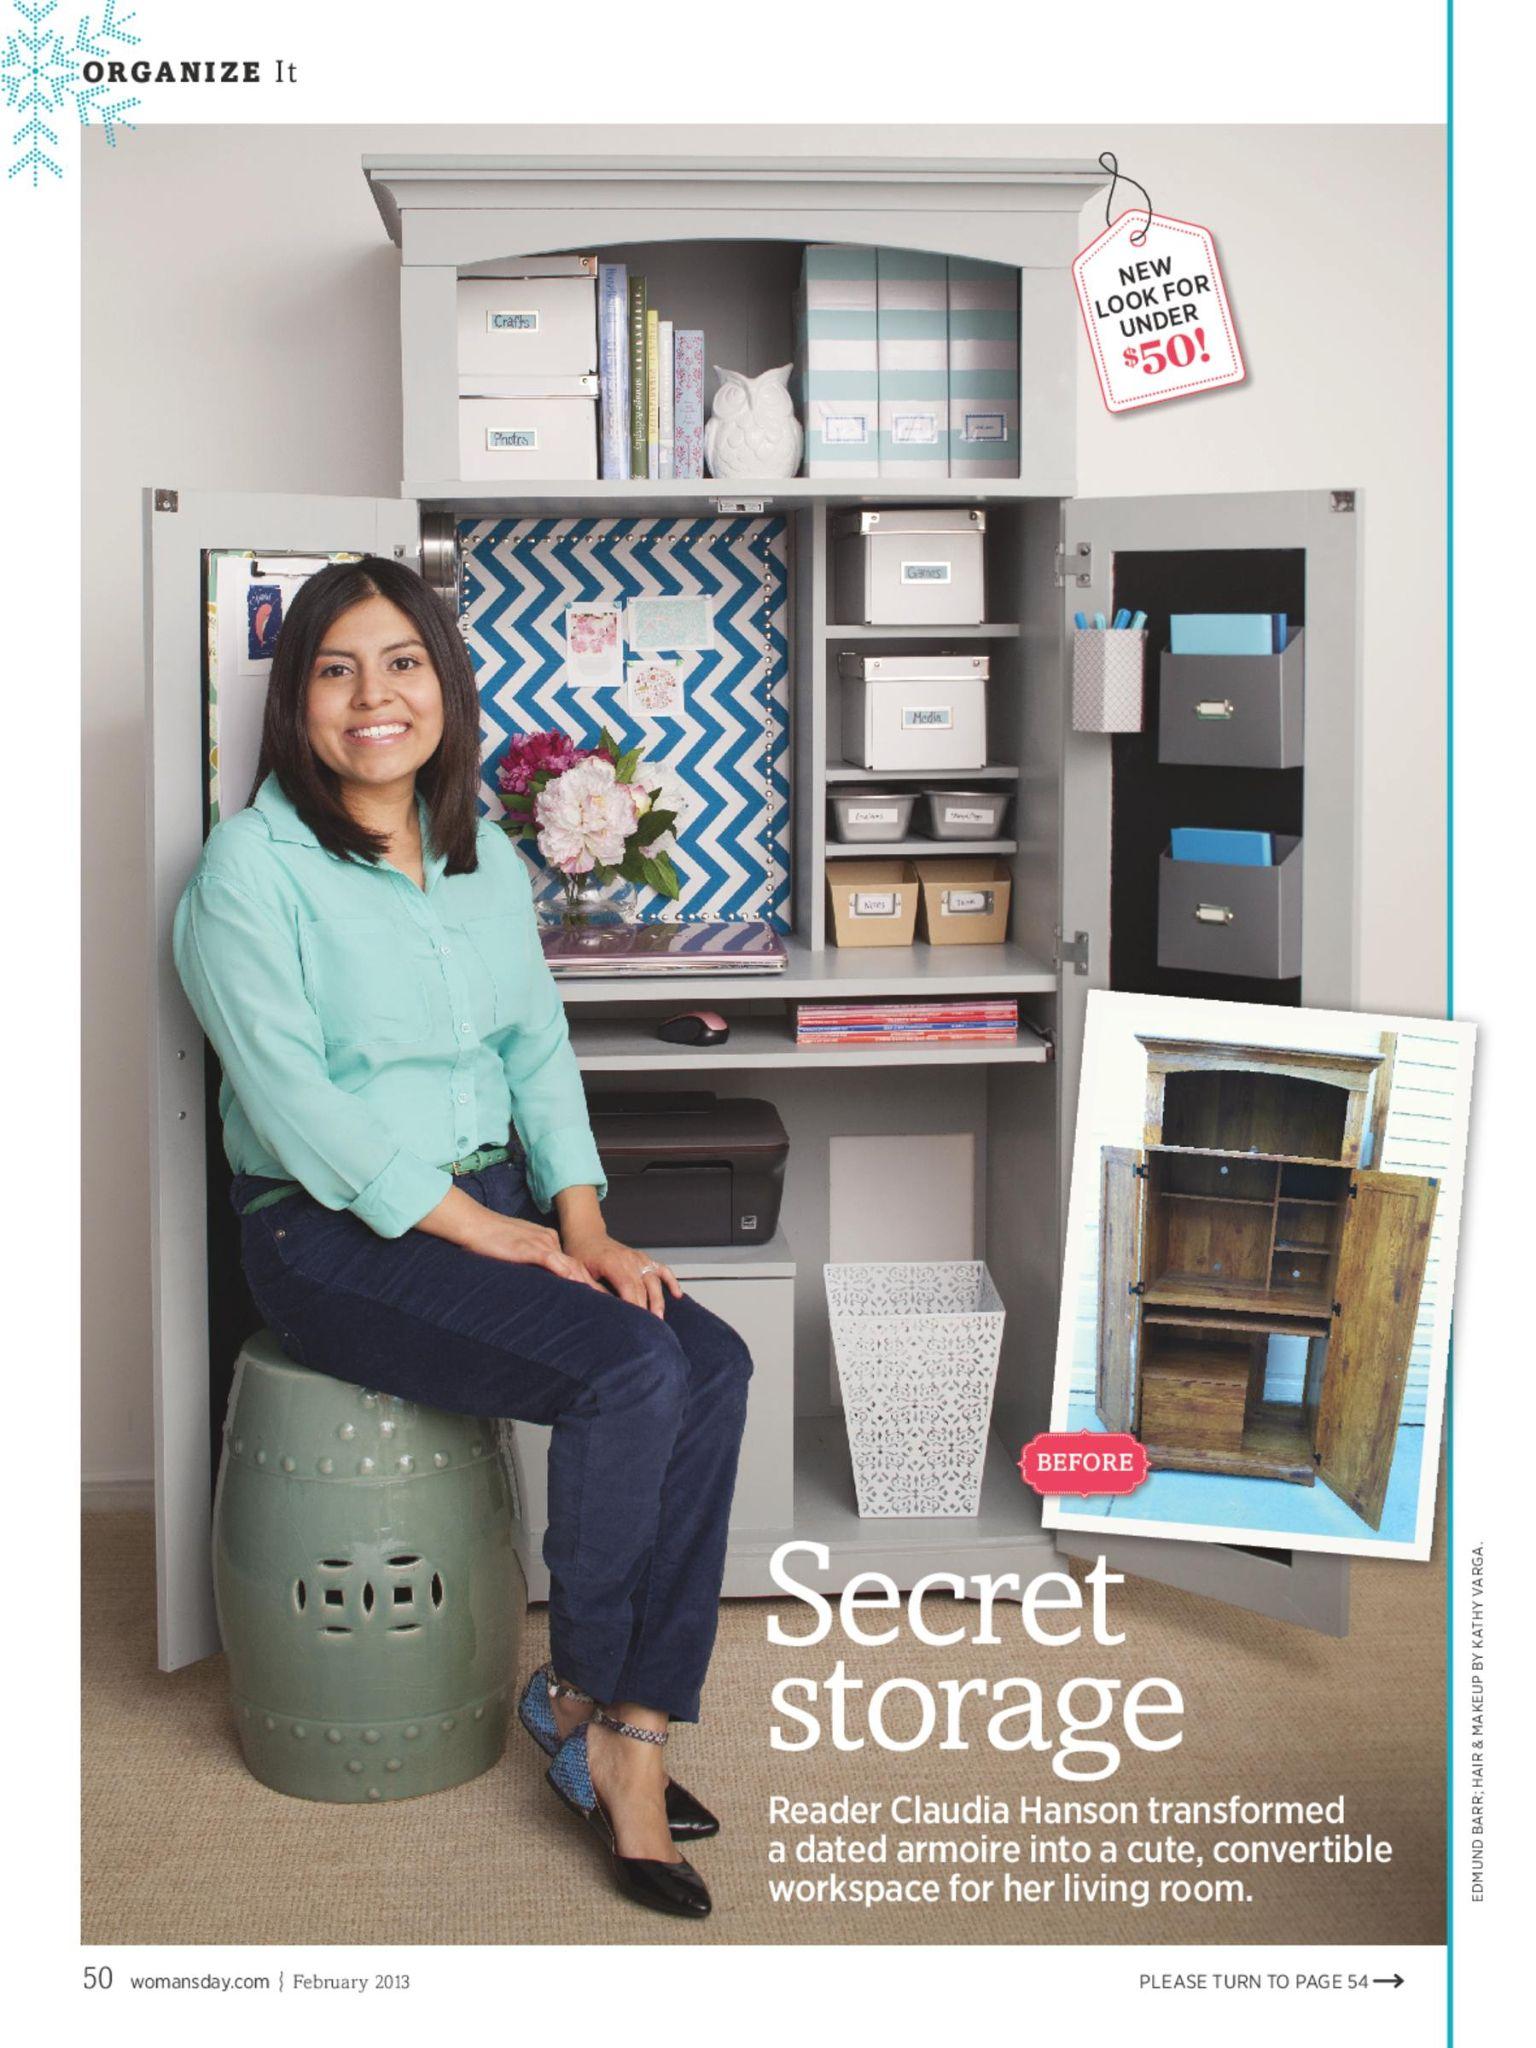 Do It Yourself Home Design: Tacky Computer Armoire Into Hidden Desk. Women's Day